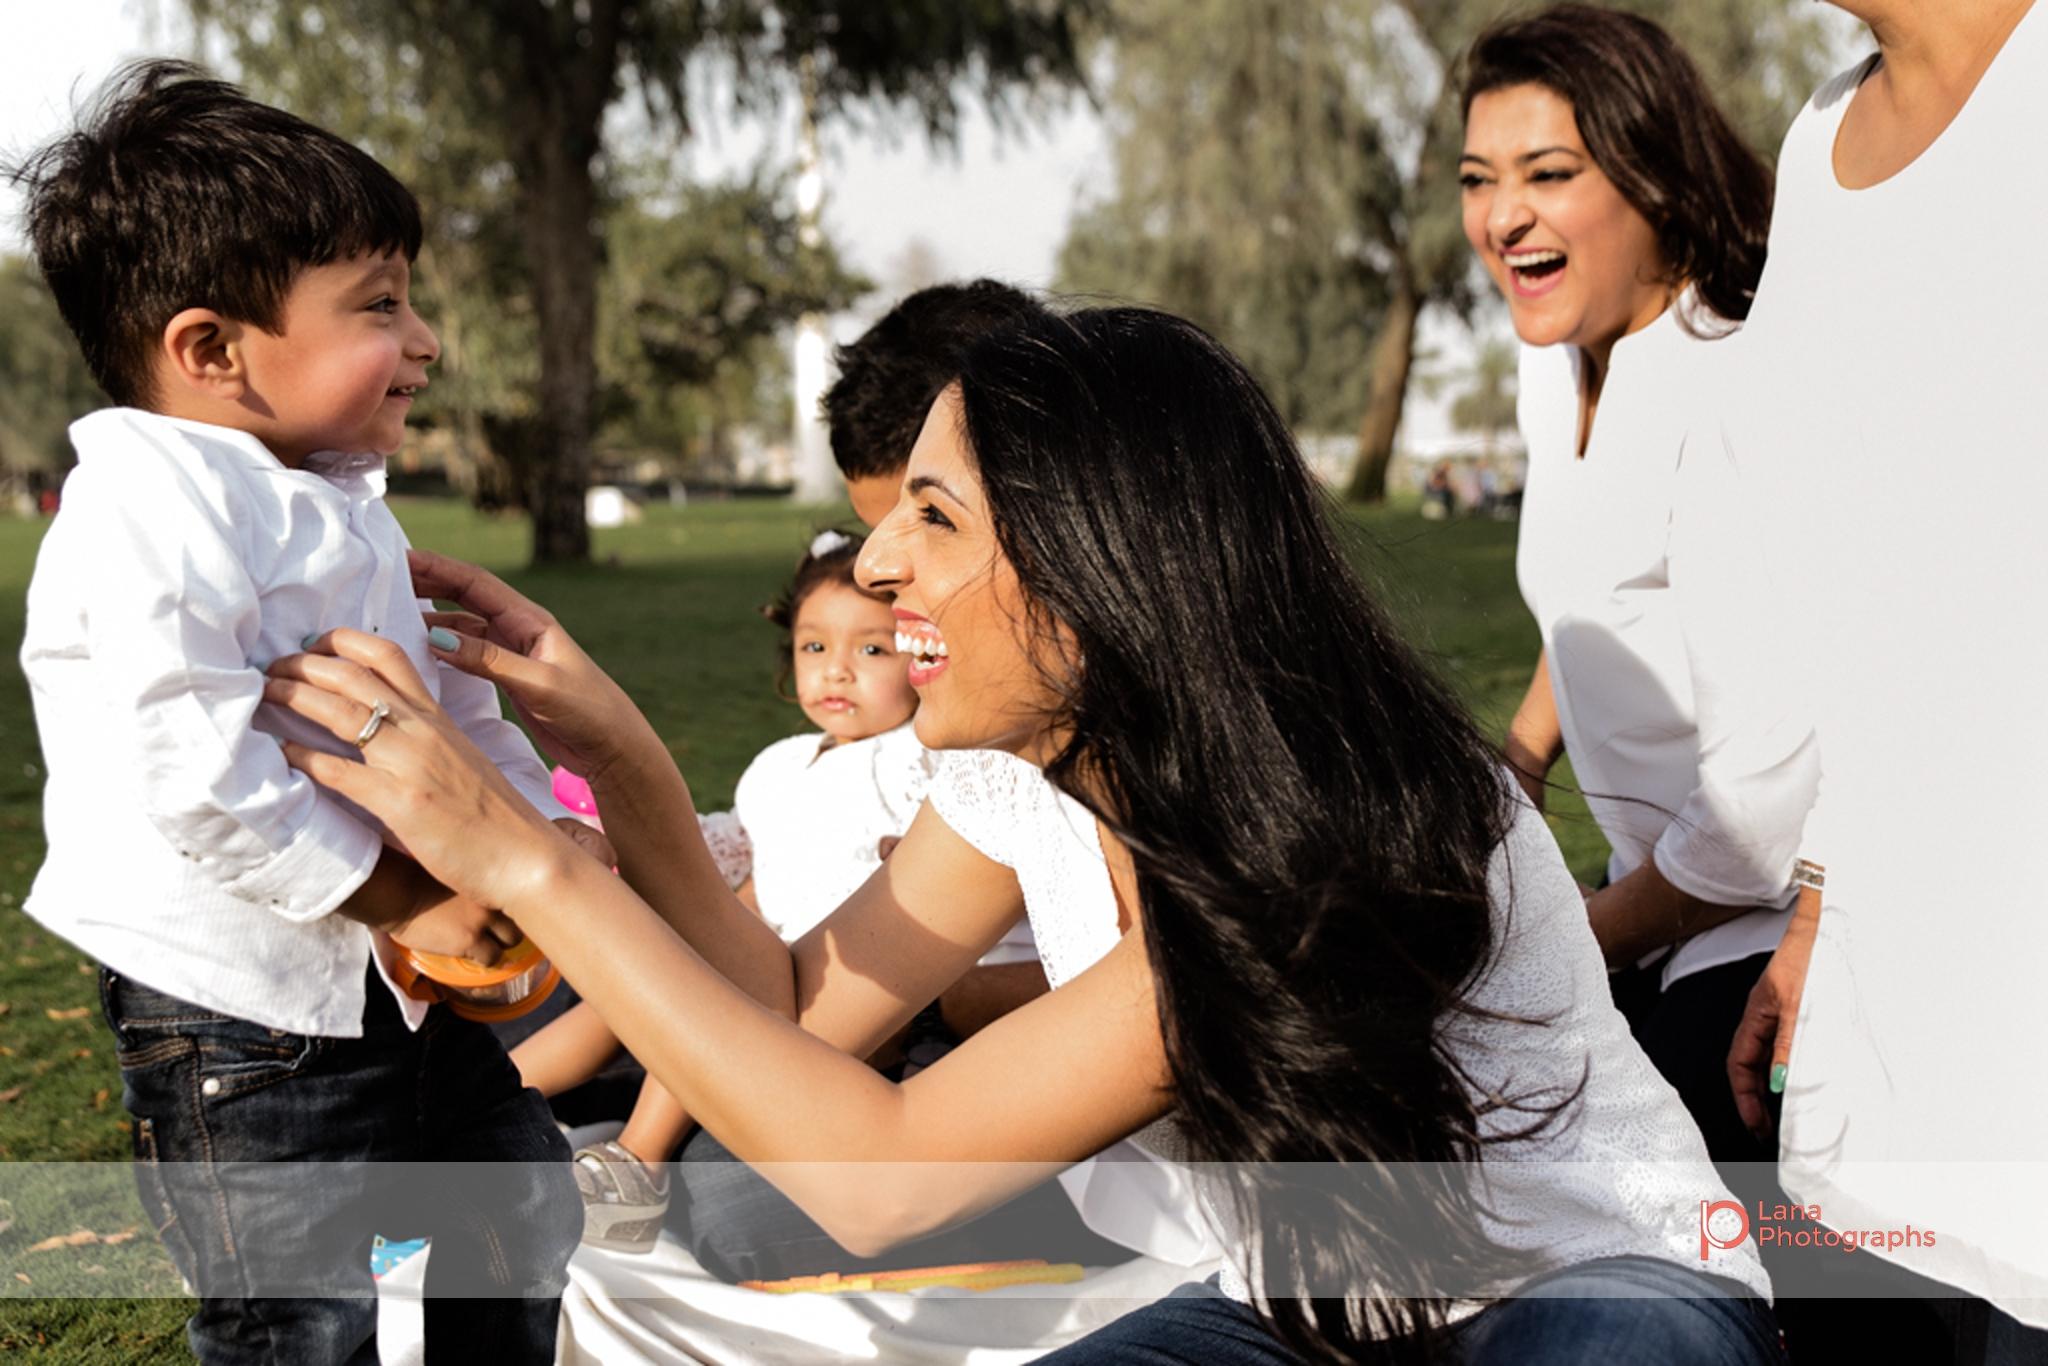 Lana Photographs Family Photographer Dubai Top Family Photographers family playing tickle war in the park